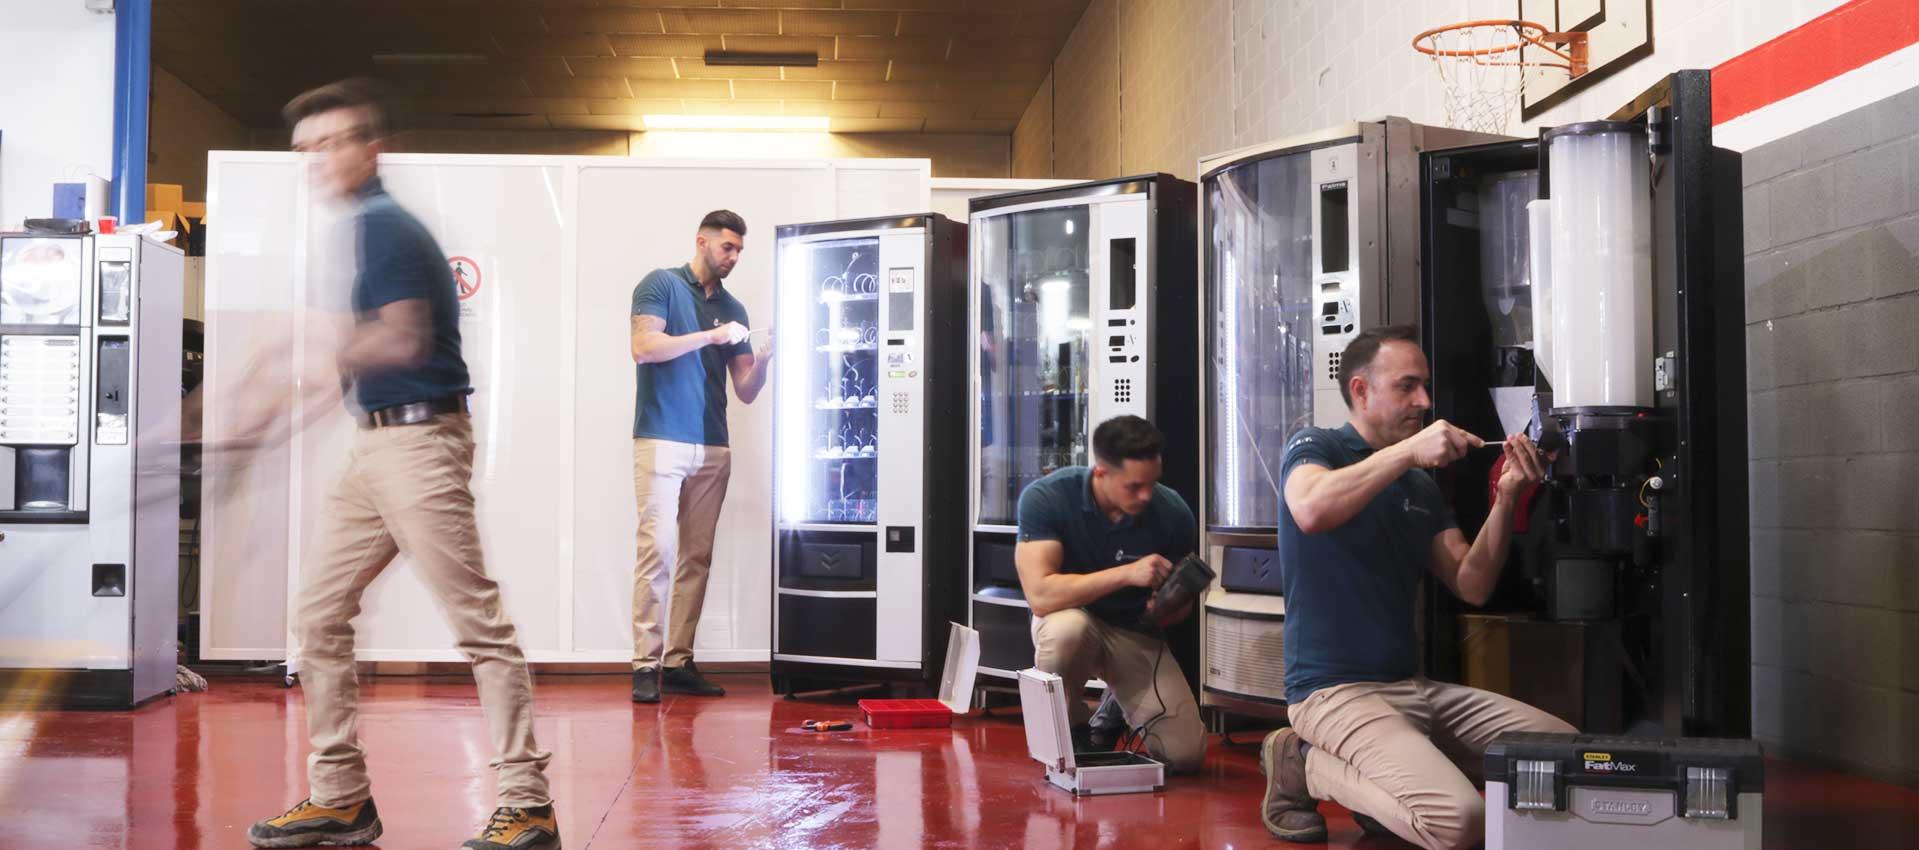 coffeevending-malaga-servicio-tecnico-oficial